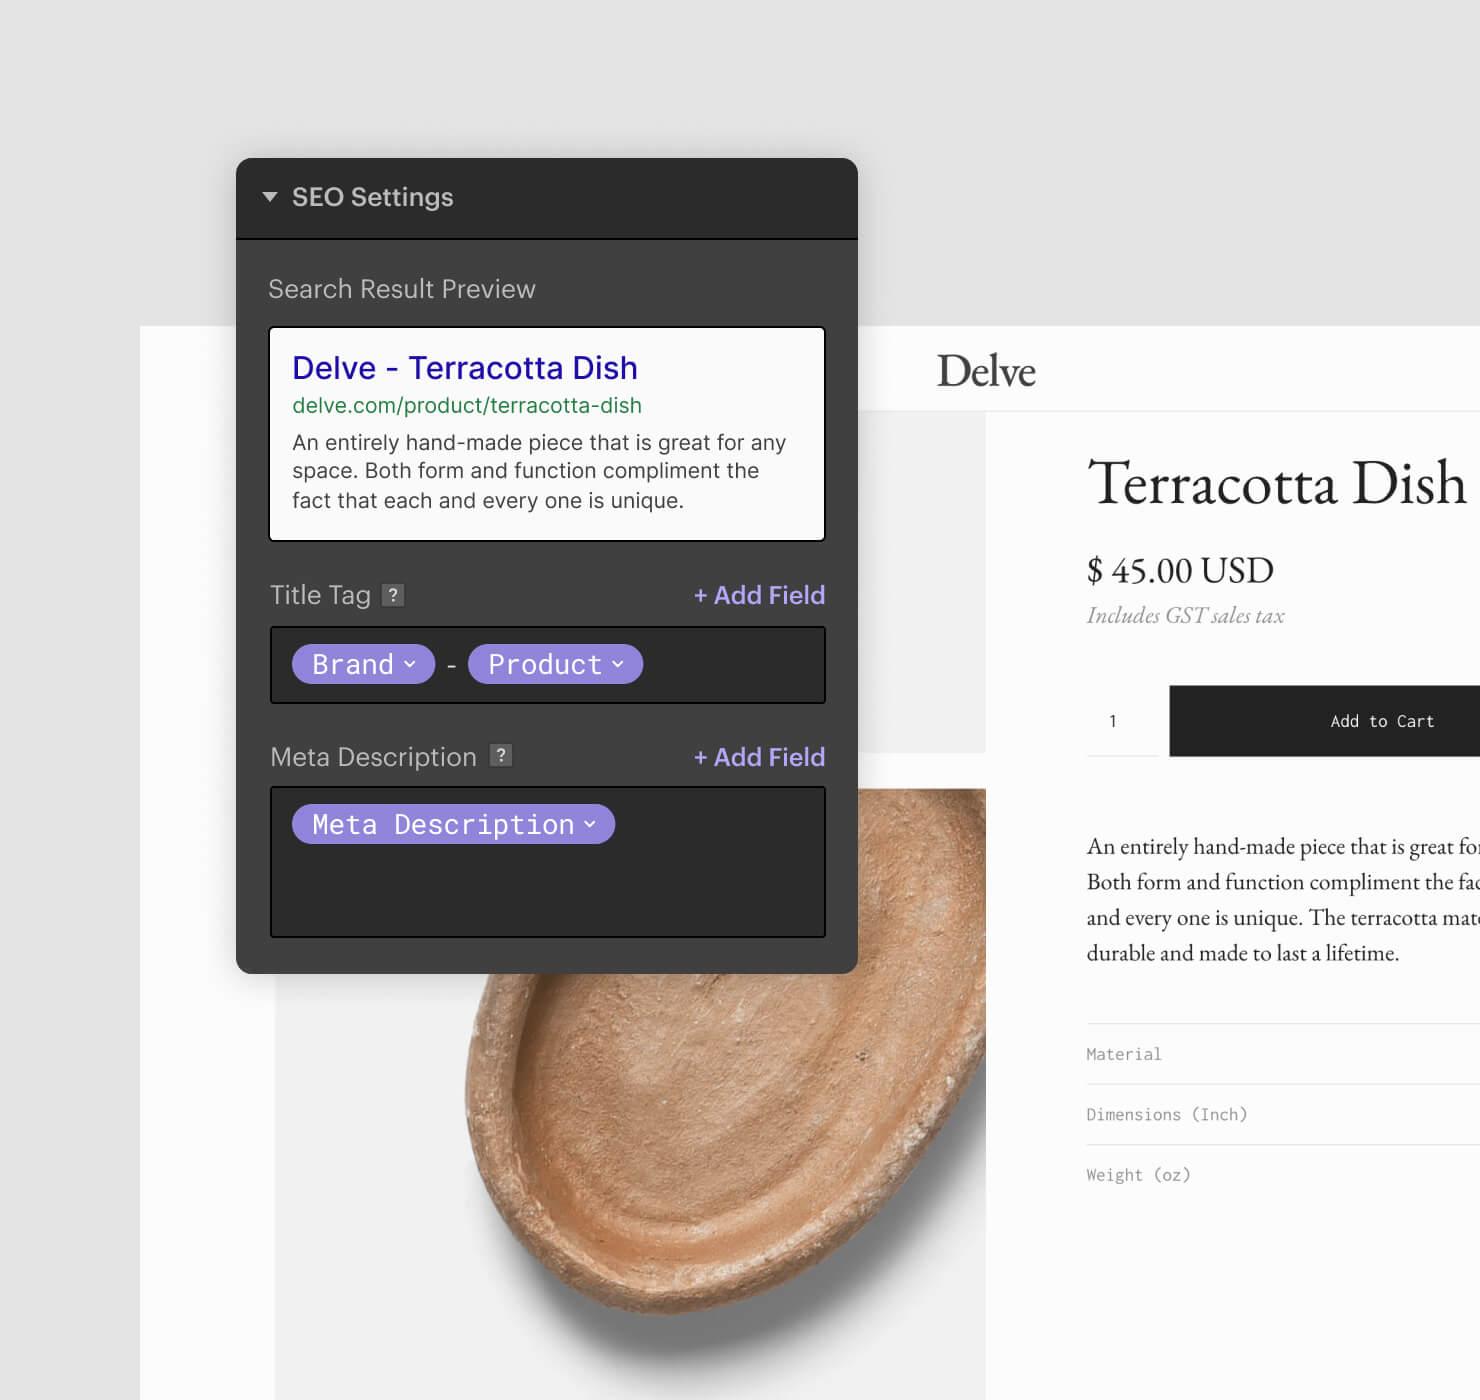 Designer UI of Meta Title and Description settings